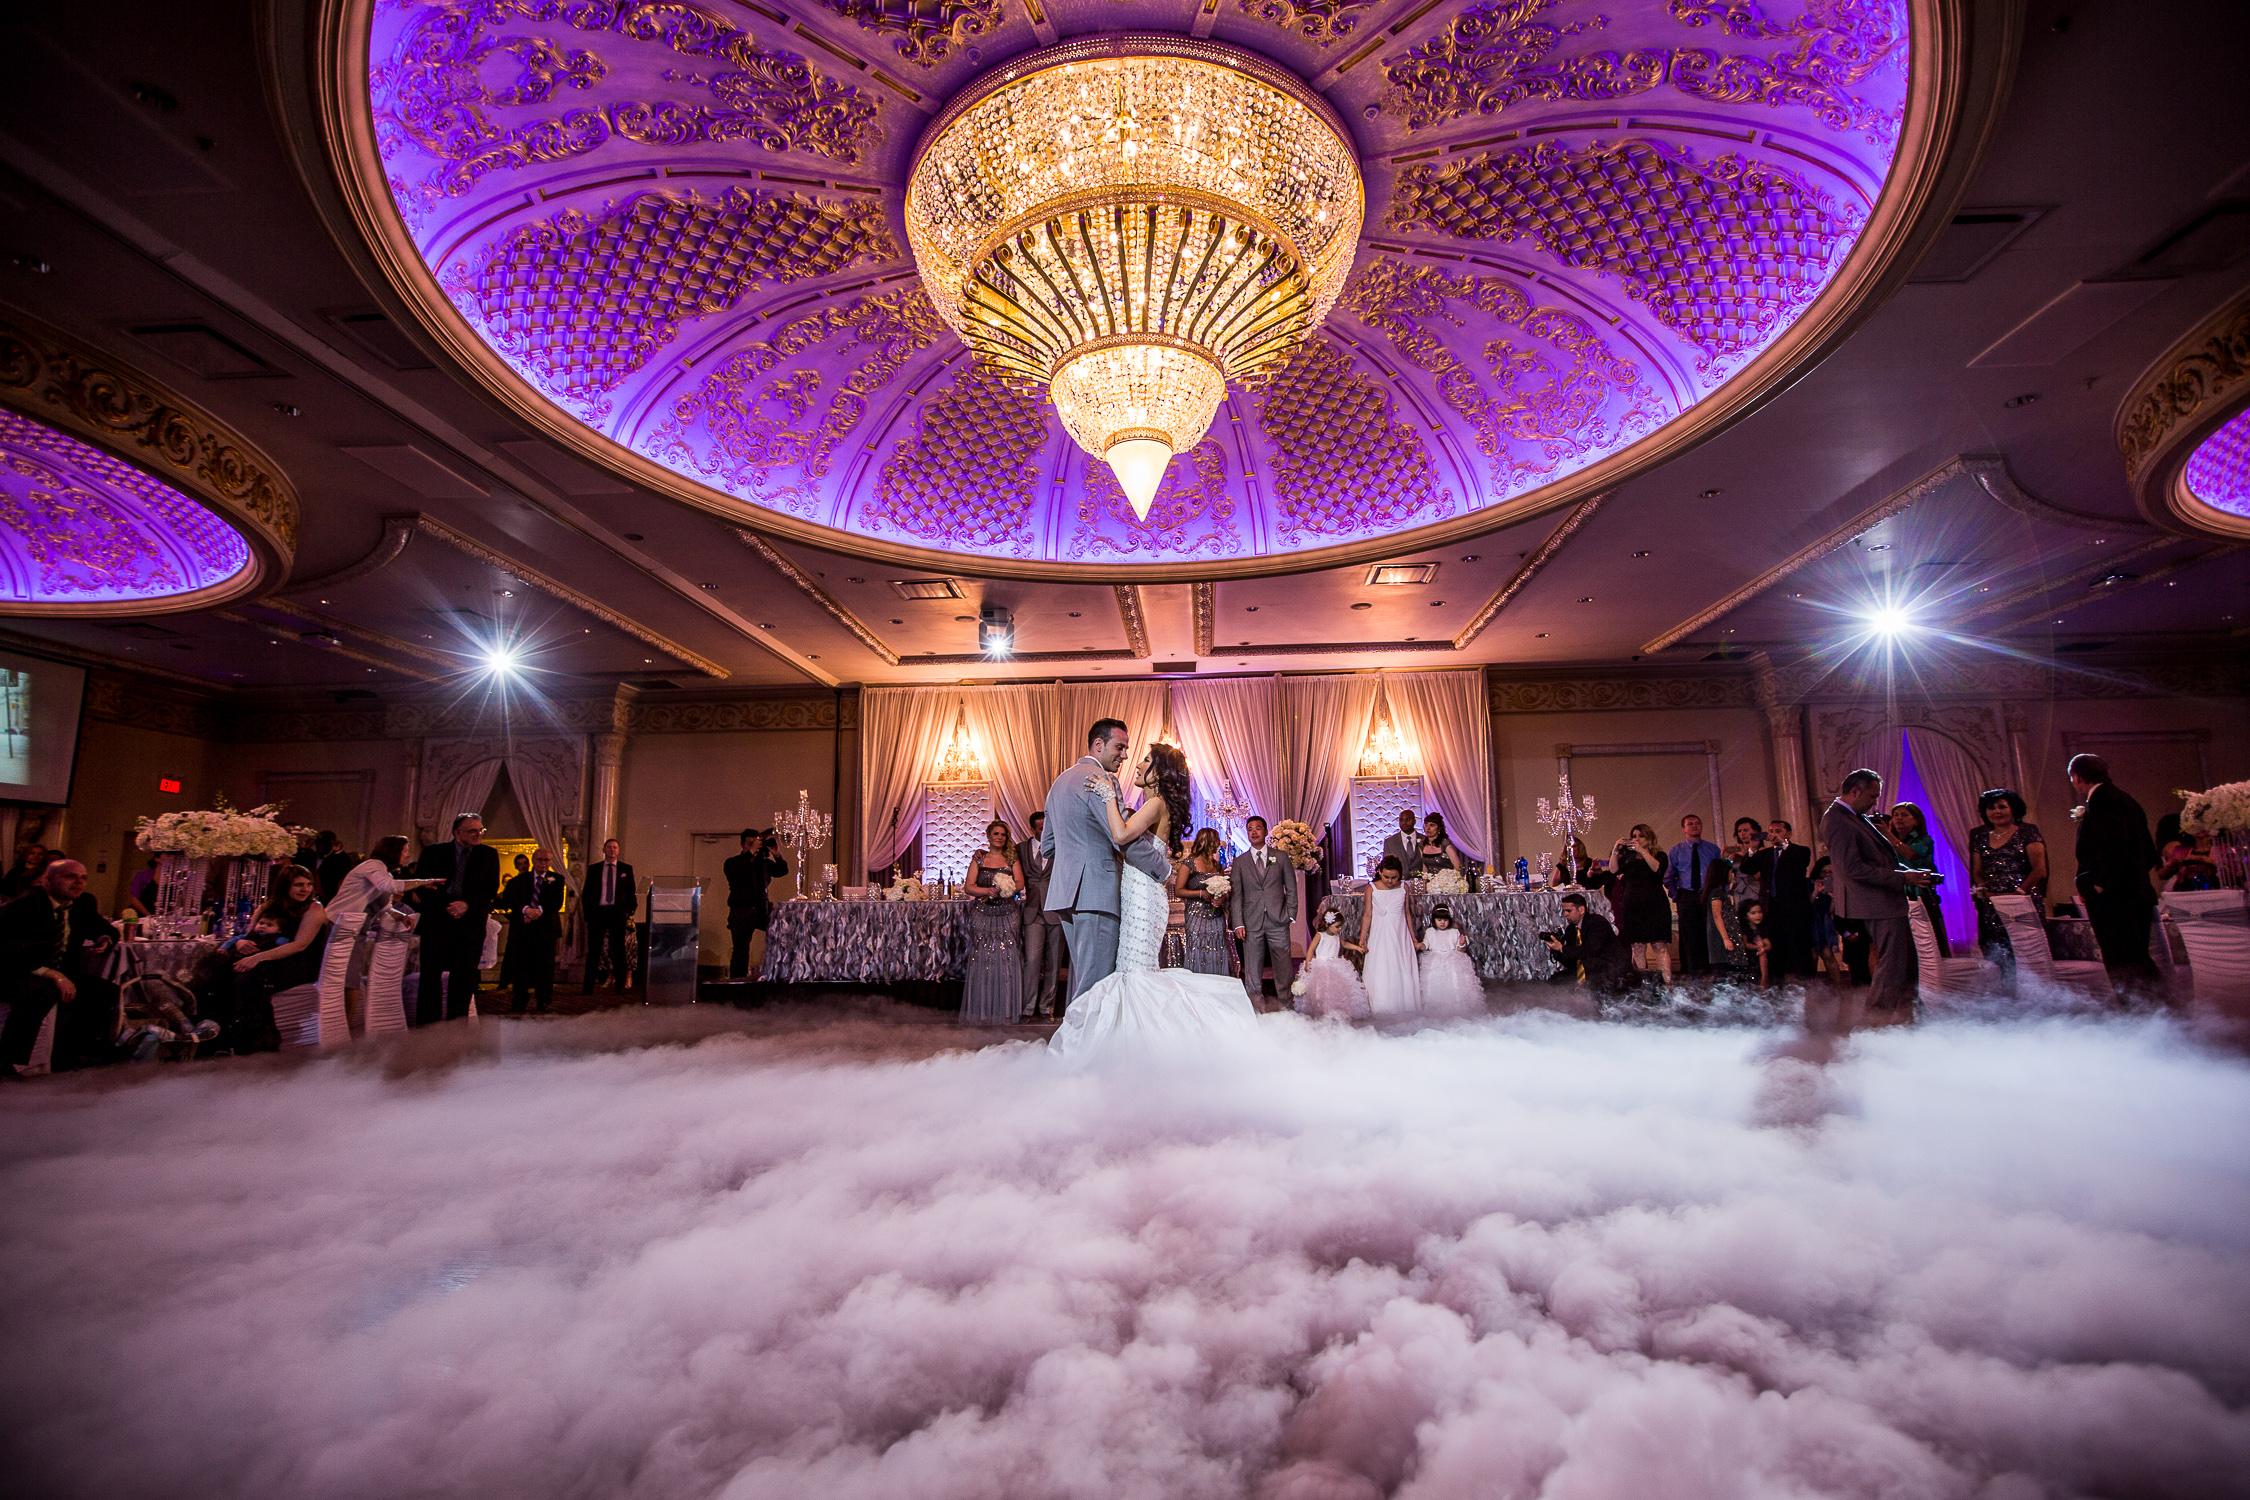 Paradise-Banquet-Hall-Wedding-Vaughan-Ontario-0074.jpg